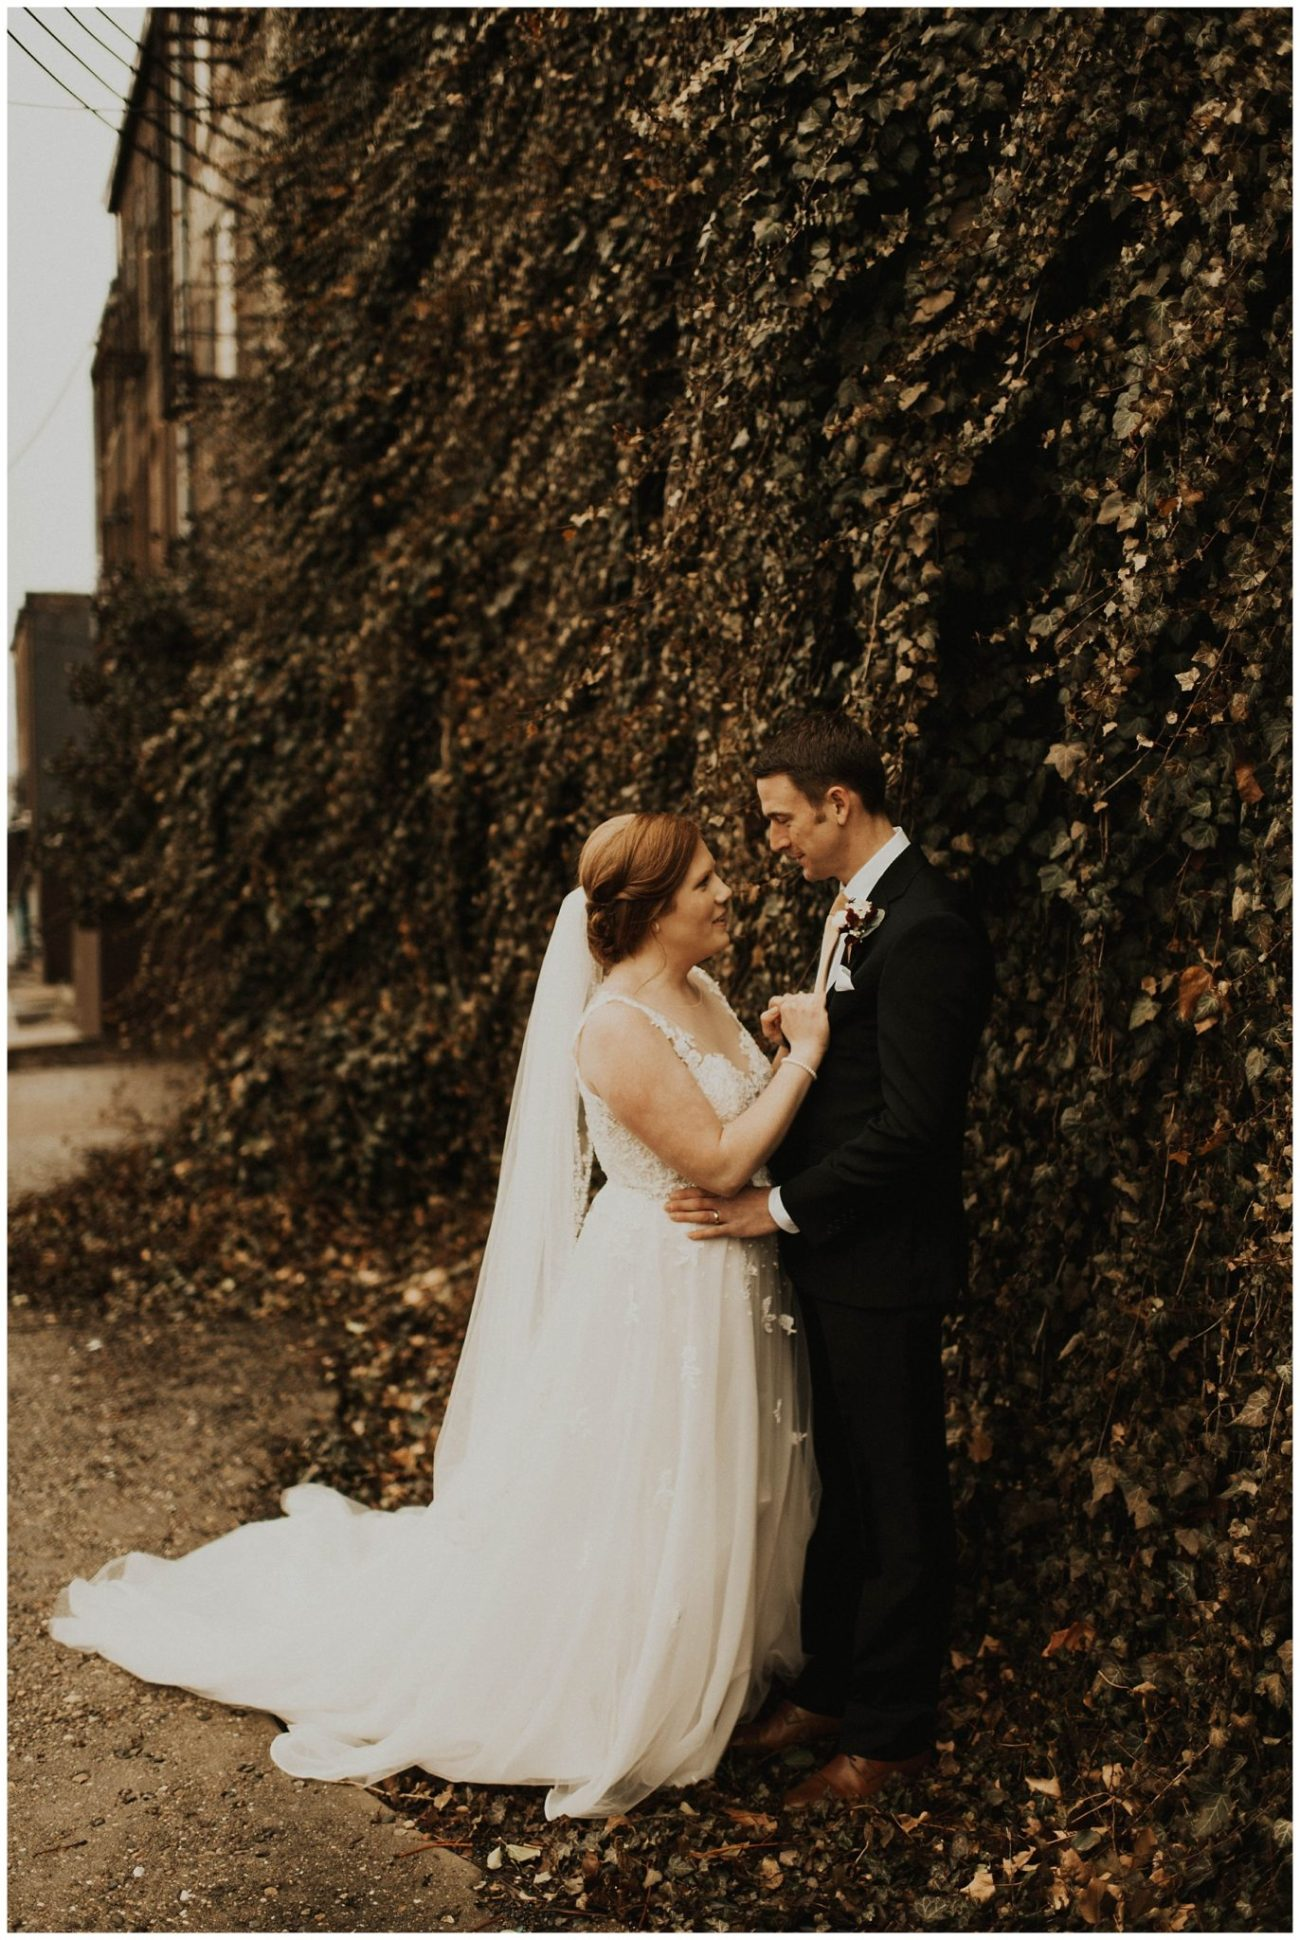 f2c3b21c Johnny + Eliza // Classic Winter Wedding - Lauren F.otography ...